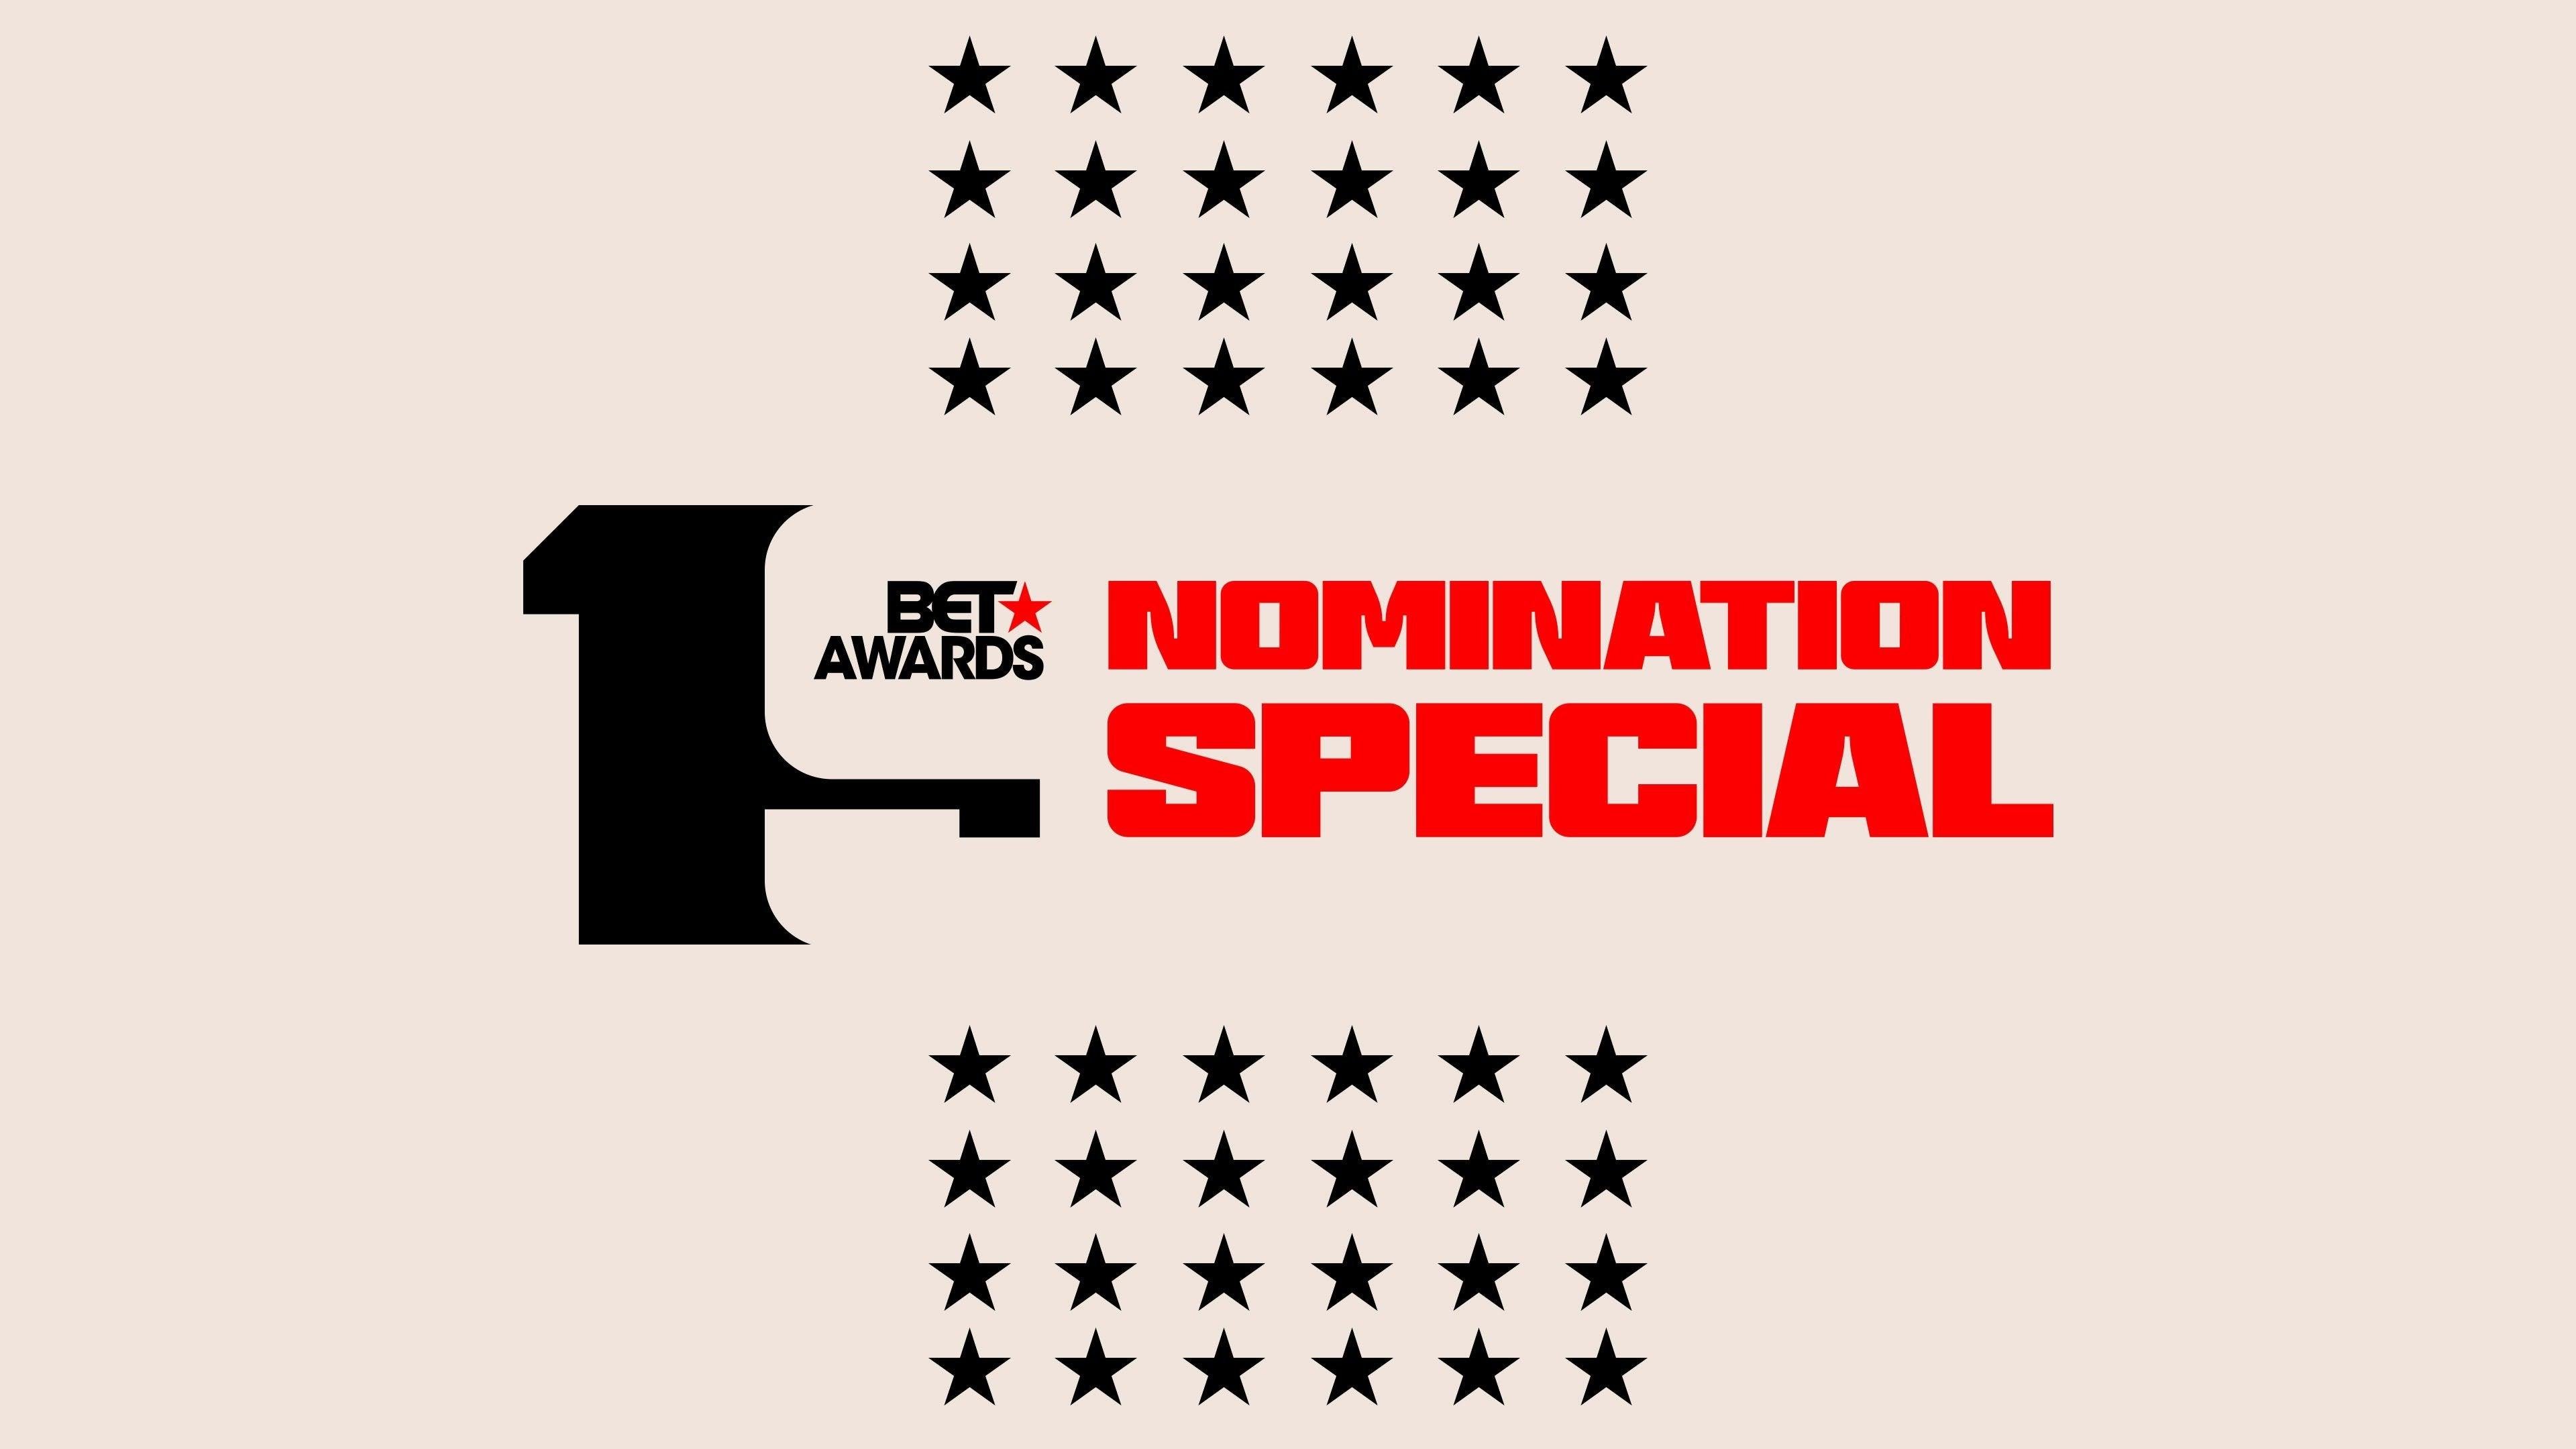 BET Awards '19 Nomination Special